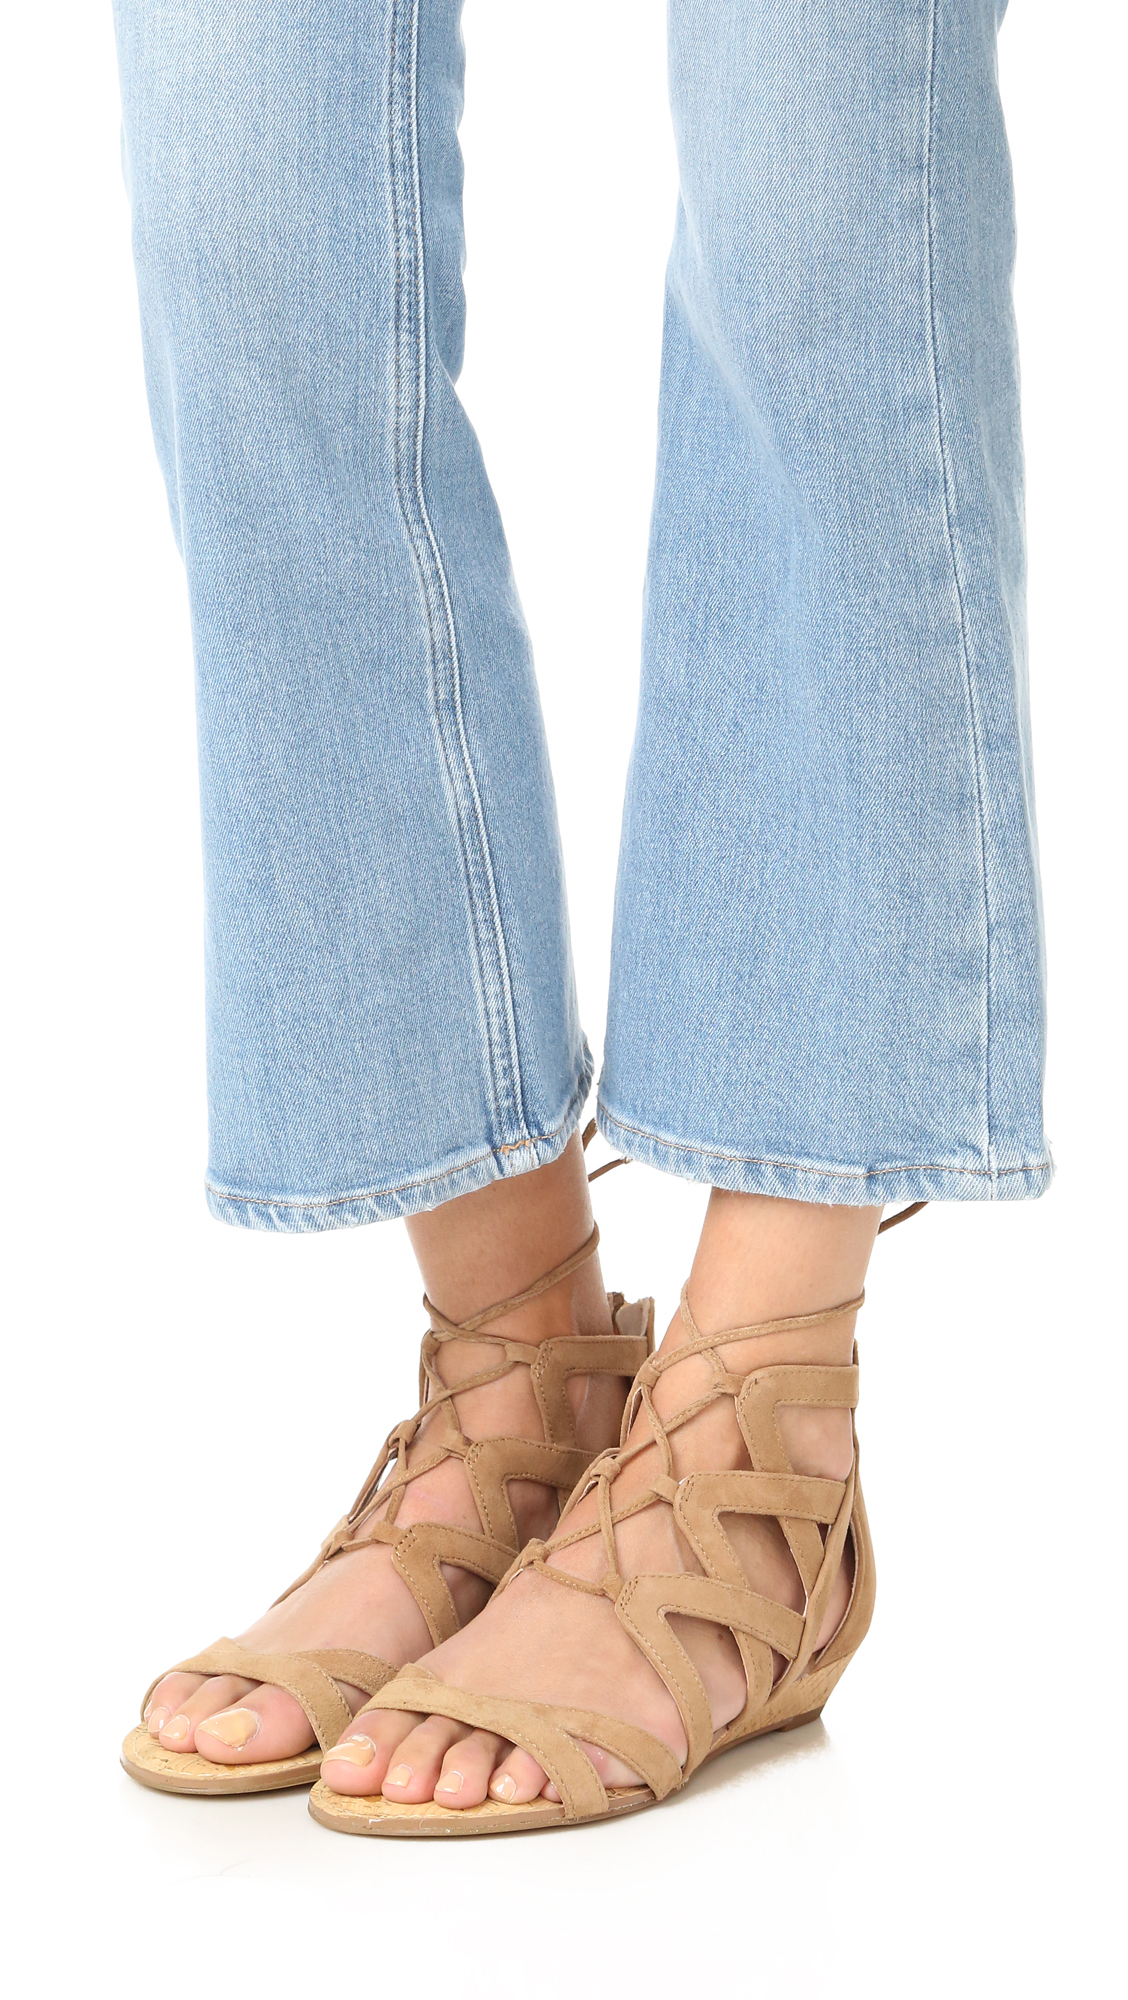 599227192766b Sam Edelman Dawson Wedge Sandals